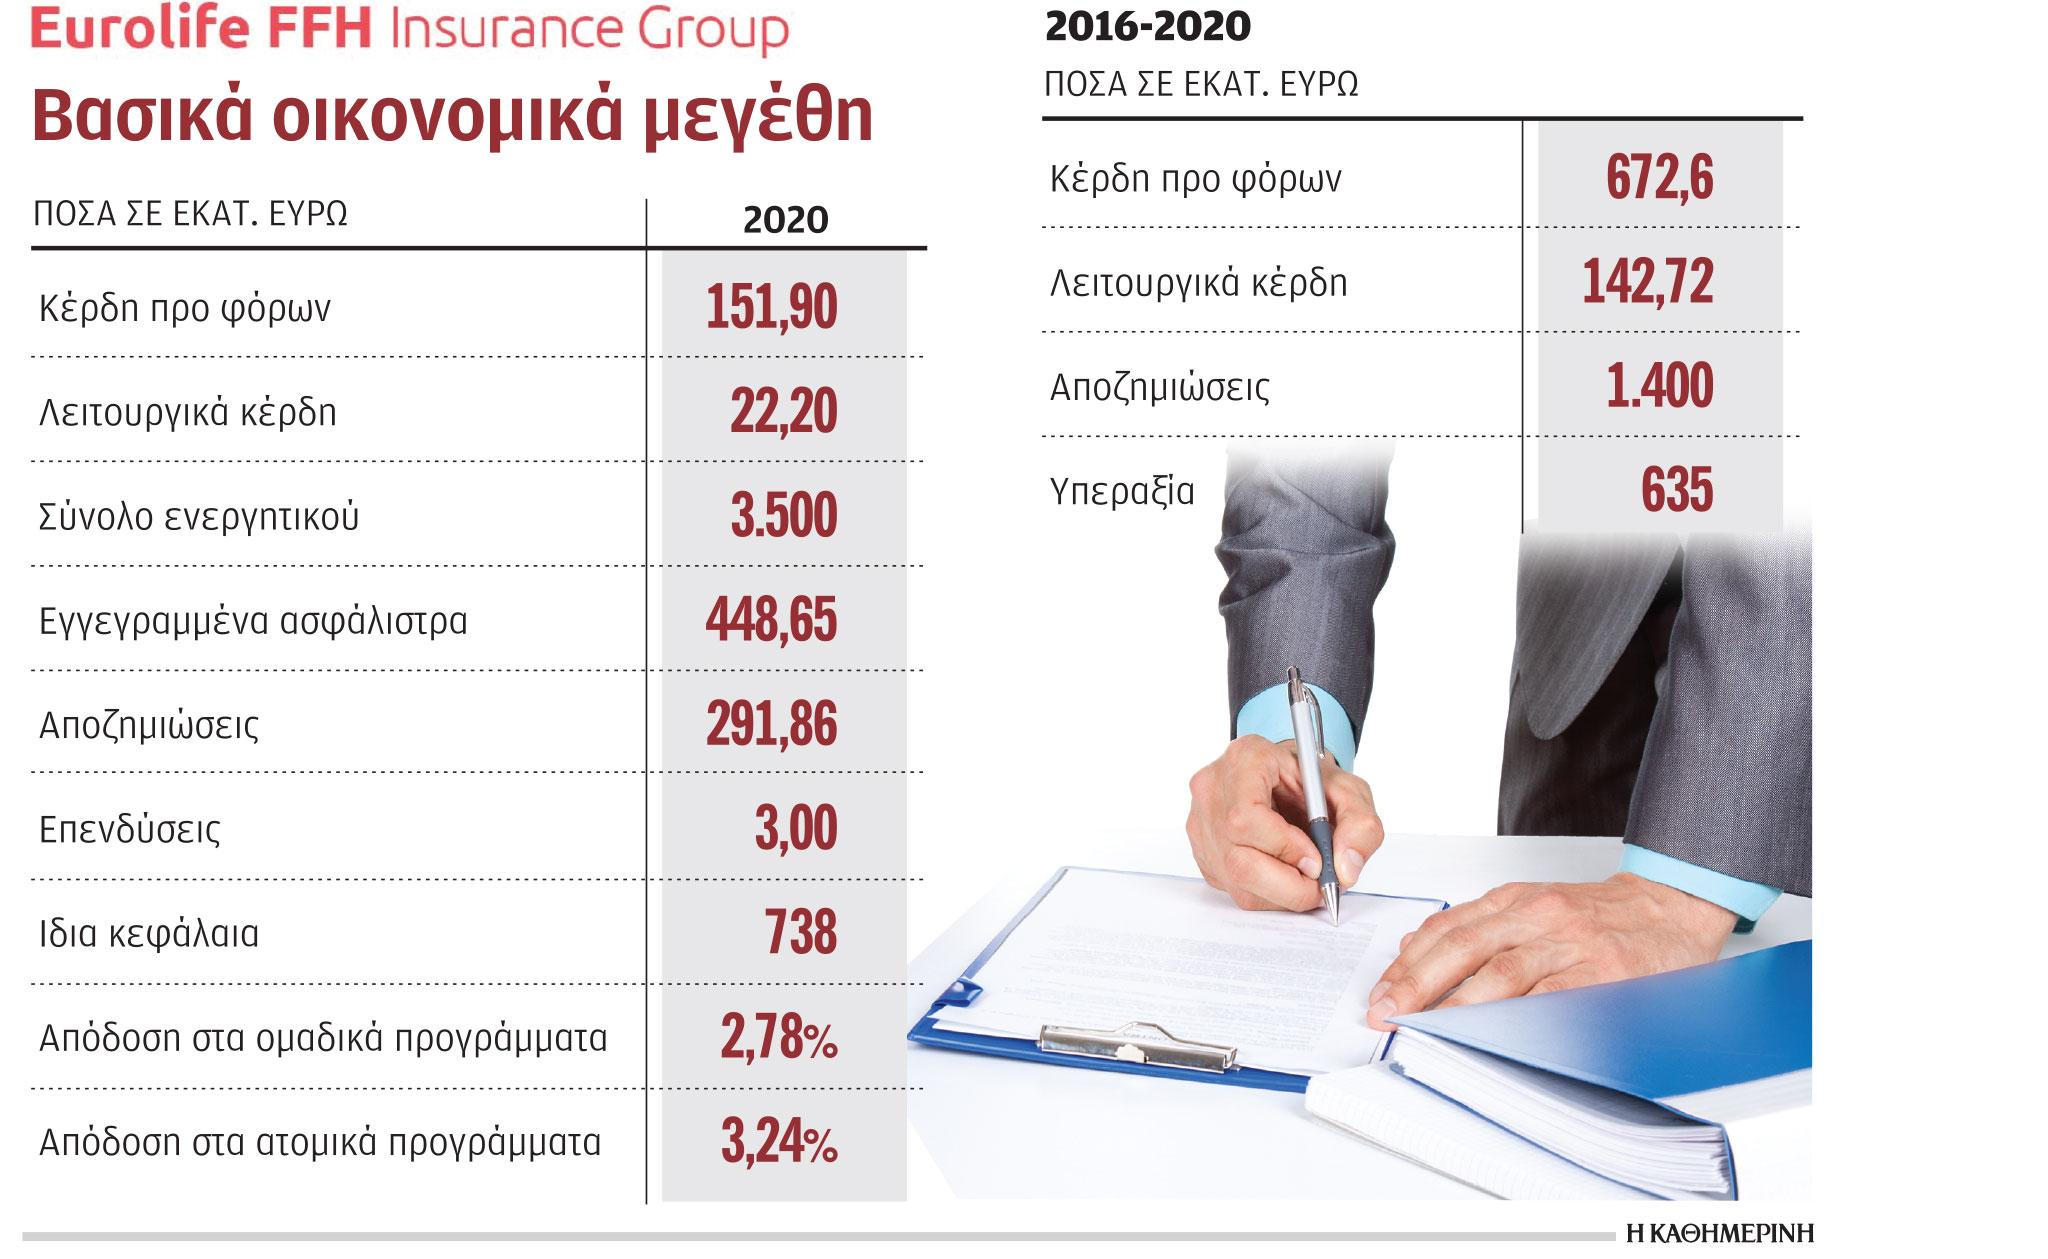 kerdi-113-5-ekat-kategrapse-to-2020-o-omilos-eurolife1